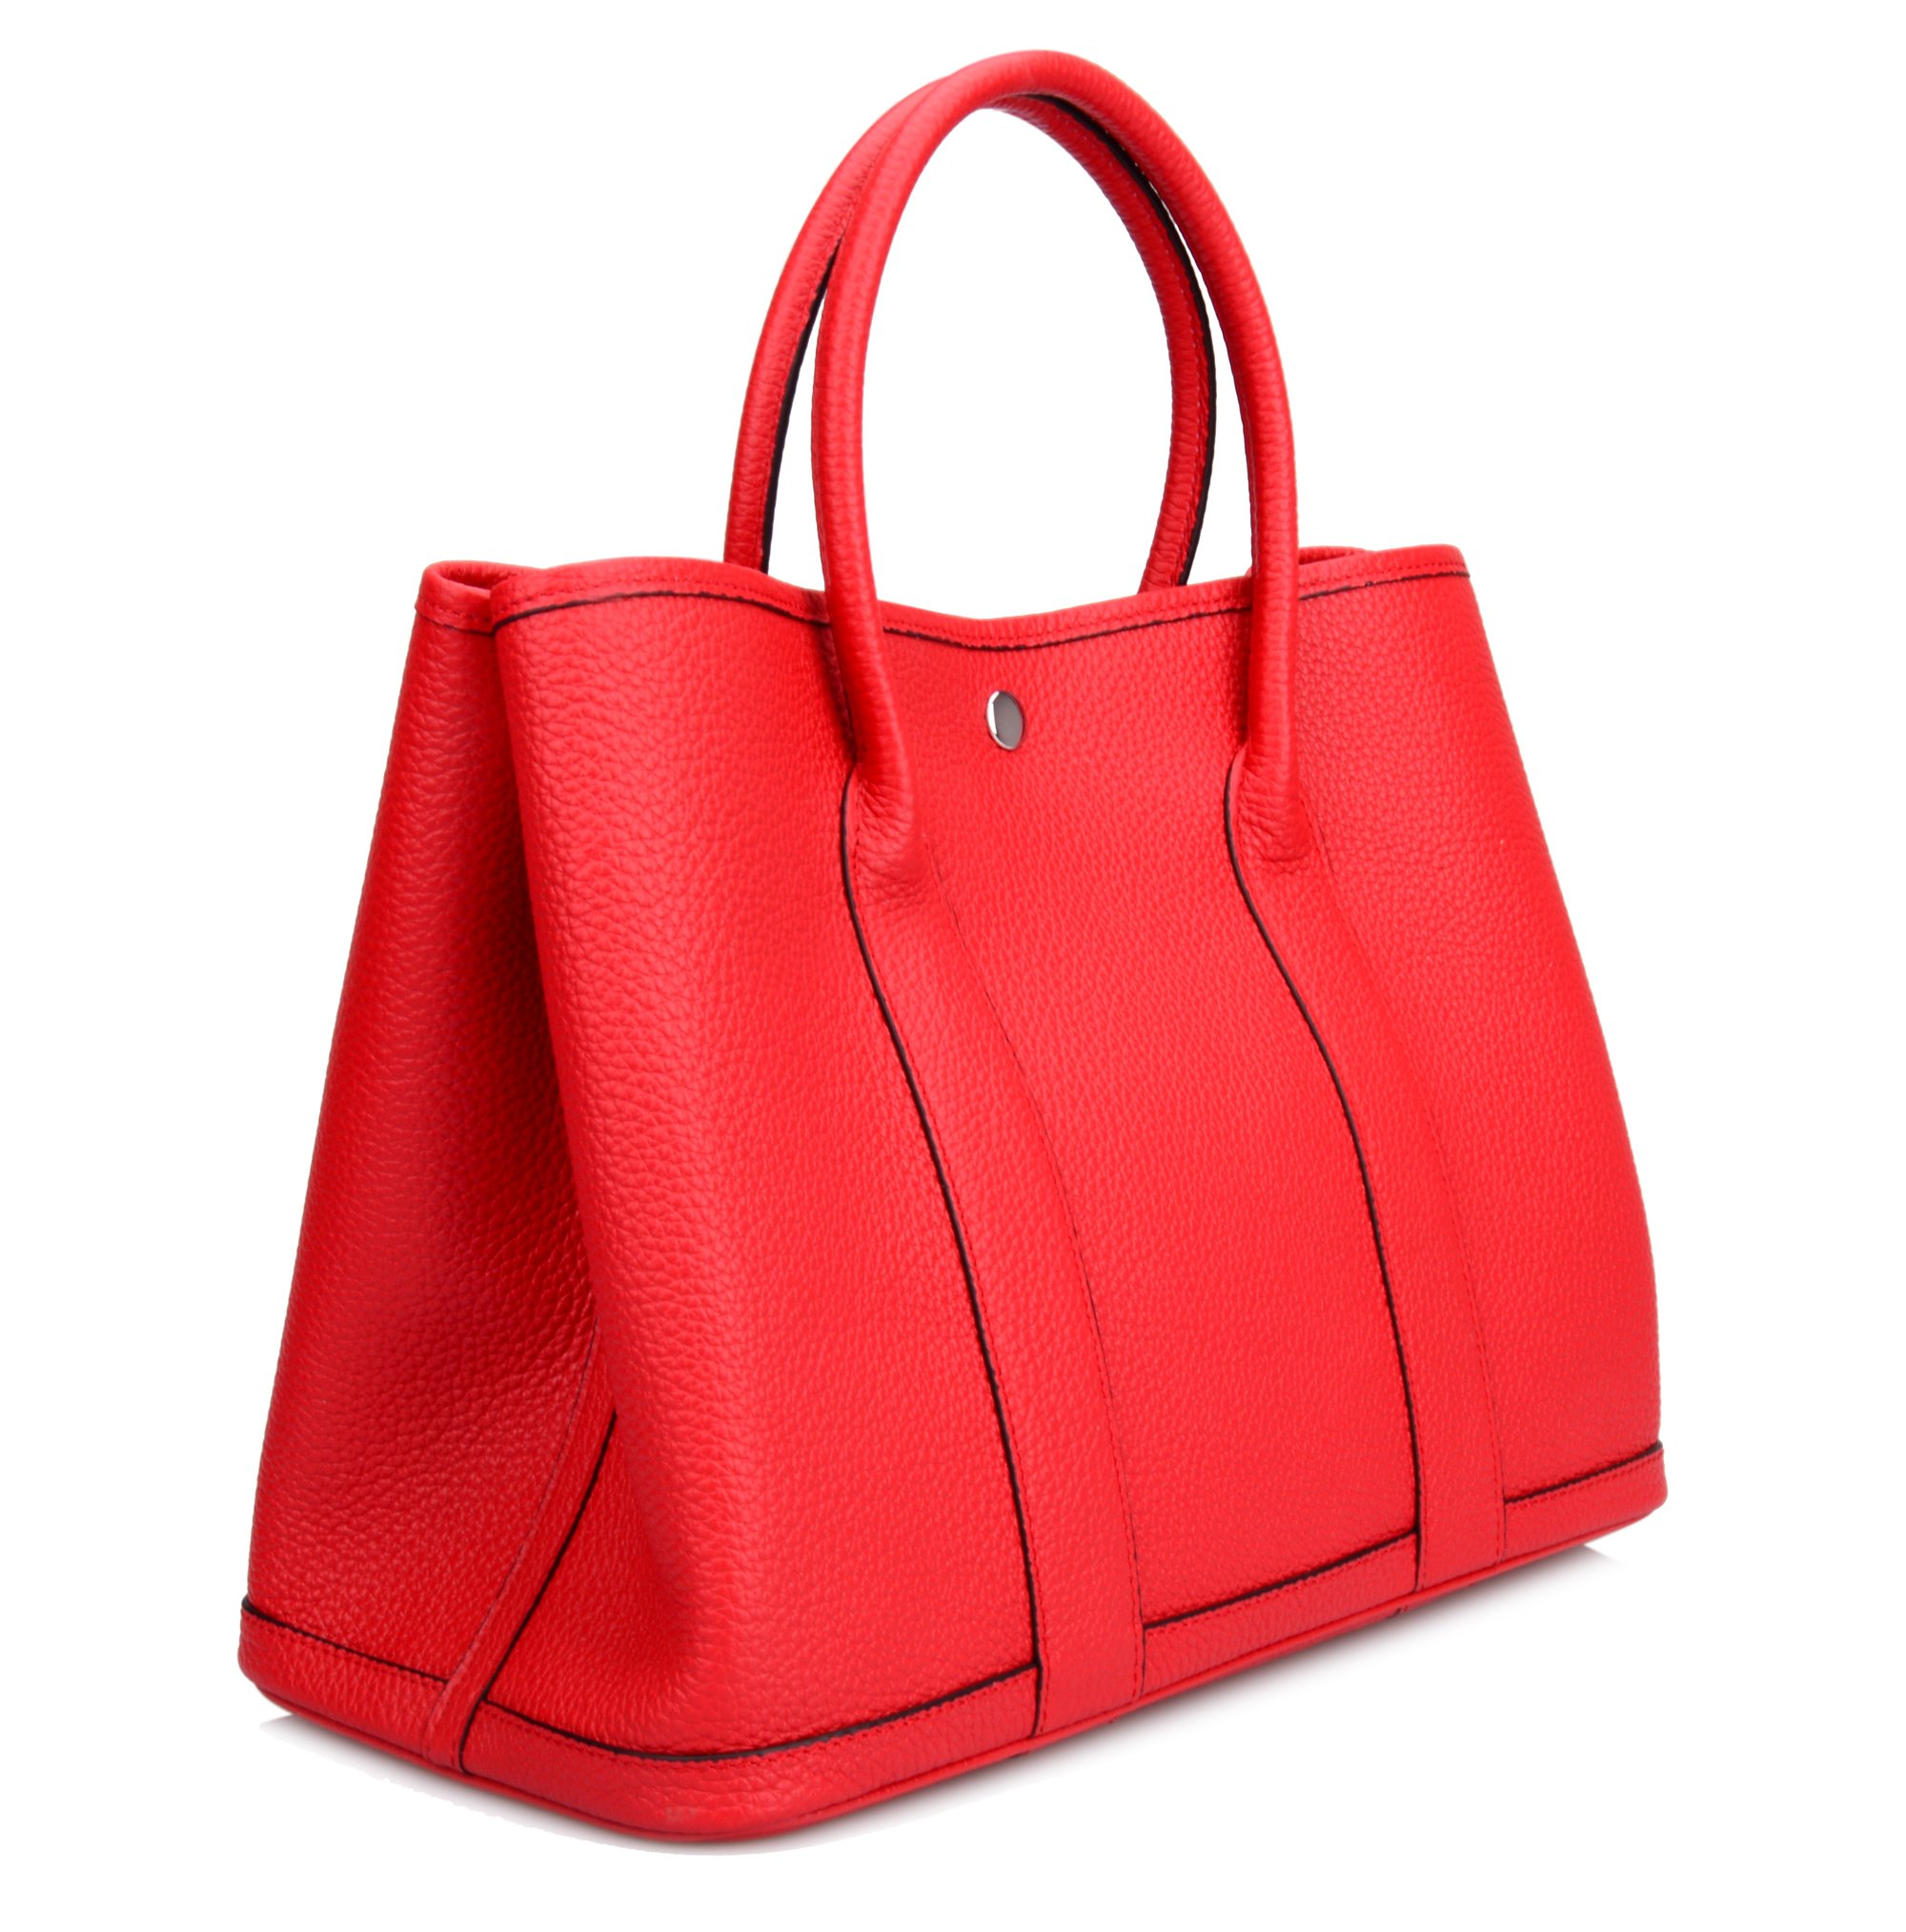 Ainifeel Women's Genuine Leather Top Handle Handbag Shopping Bag Tote Bag (Red)